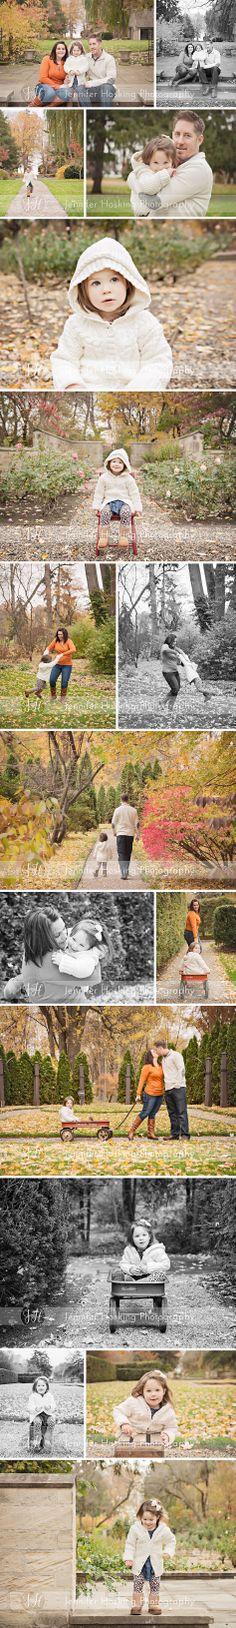 Jennifer Hosking Photography » page 2